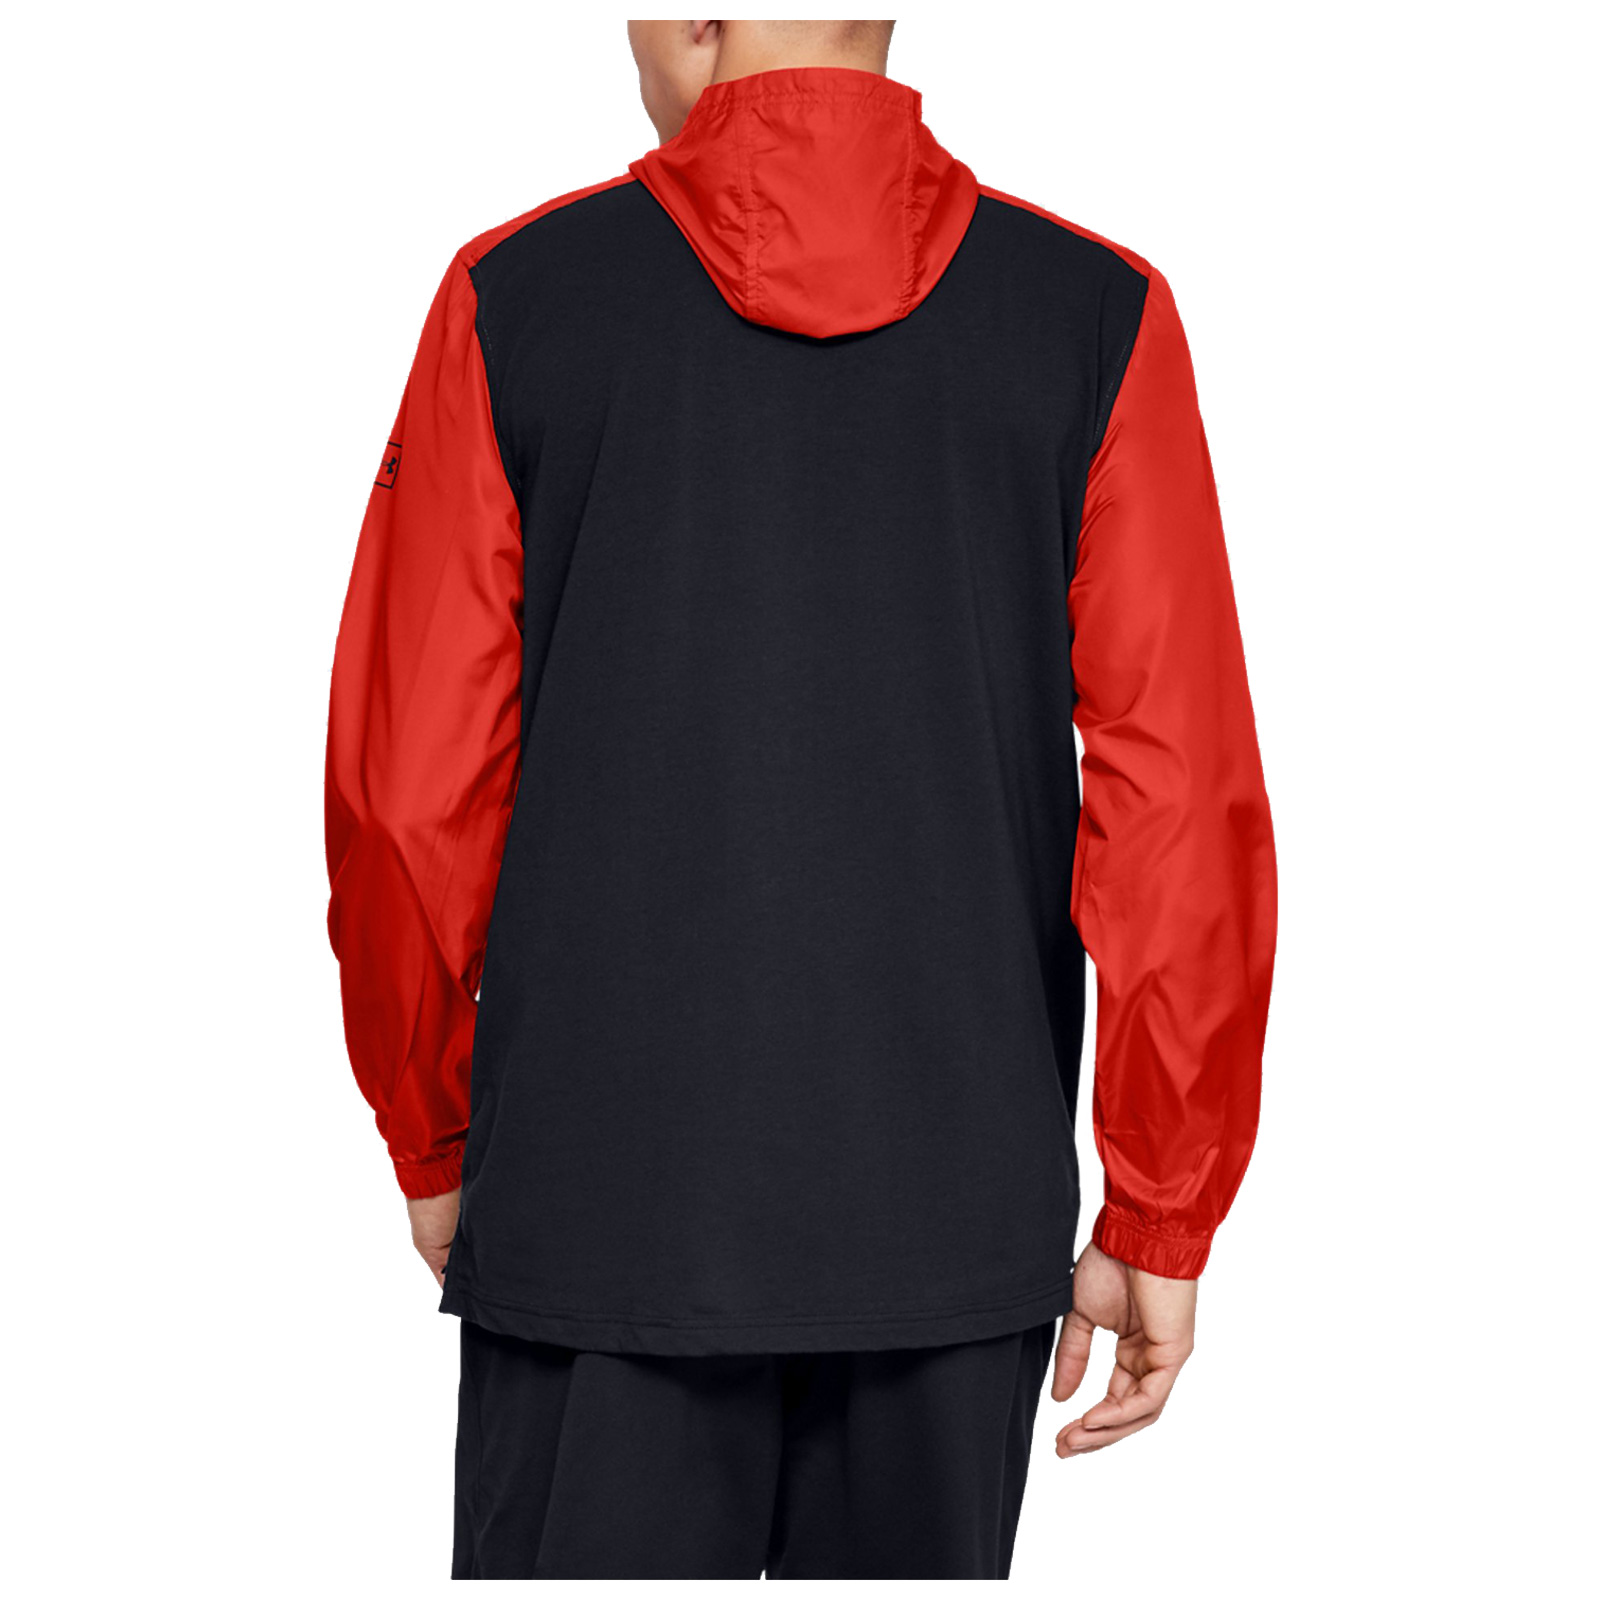 2019 Under Armour Mens Sportstyle Anorak Half Zip Pullover Windproof Jacket UA